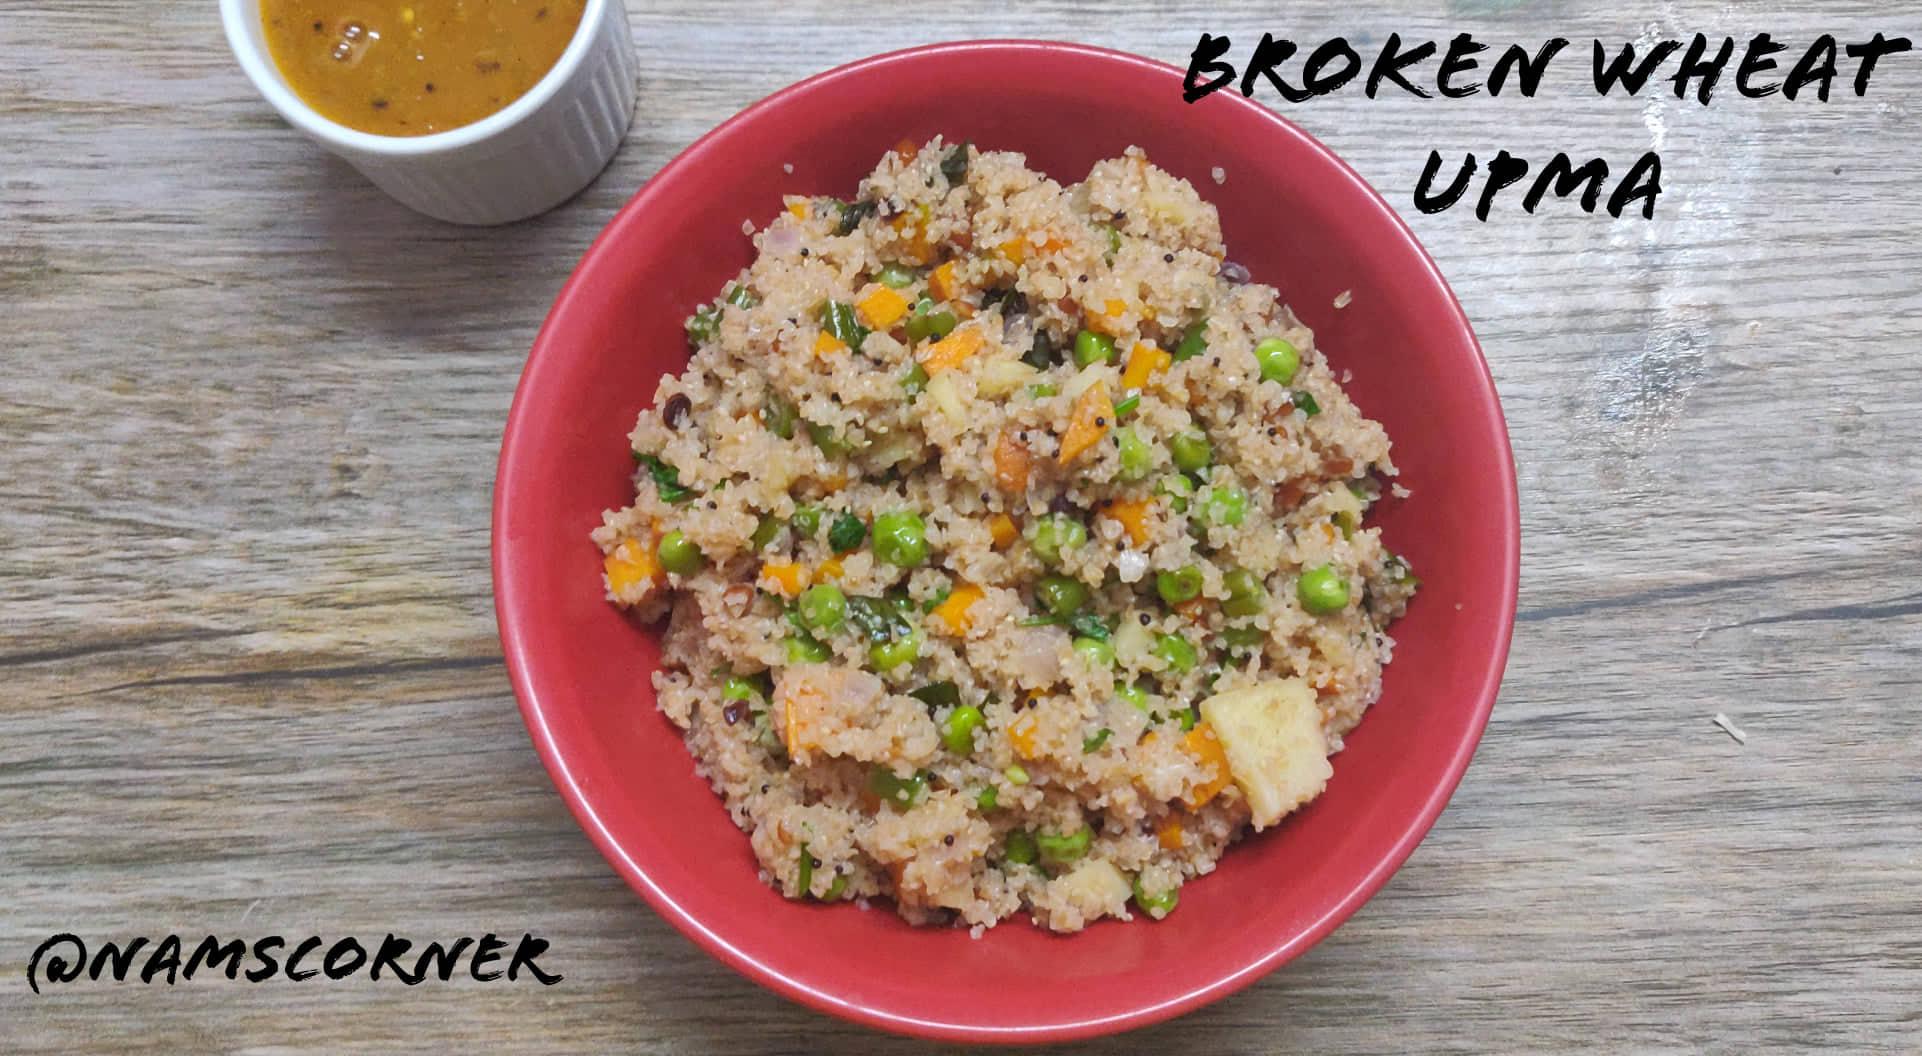 Broken Wheat upma Recipe | Samba Godhumai upma | Dhaliya Upma Recipe